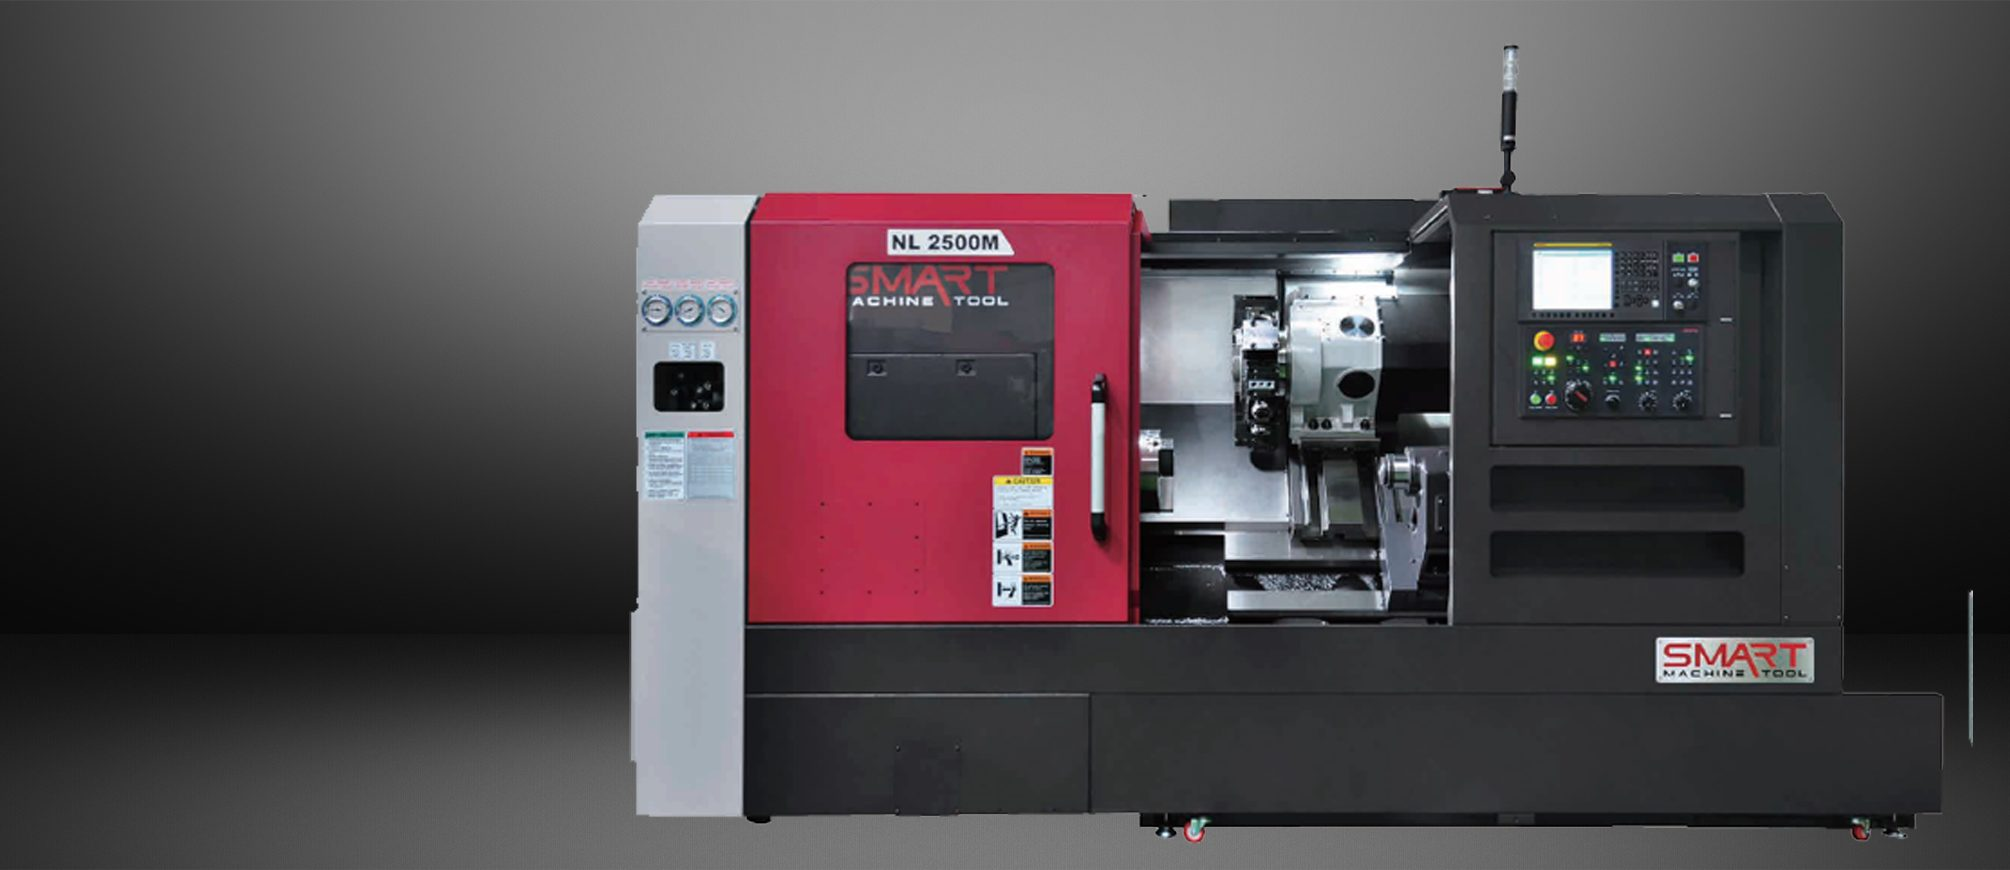 SMART NL 2500M/500 – BOX WAY – (10″ CHUCK) 3-Axis CNC Lathes